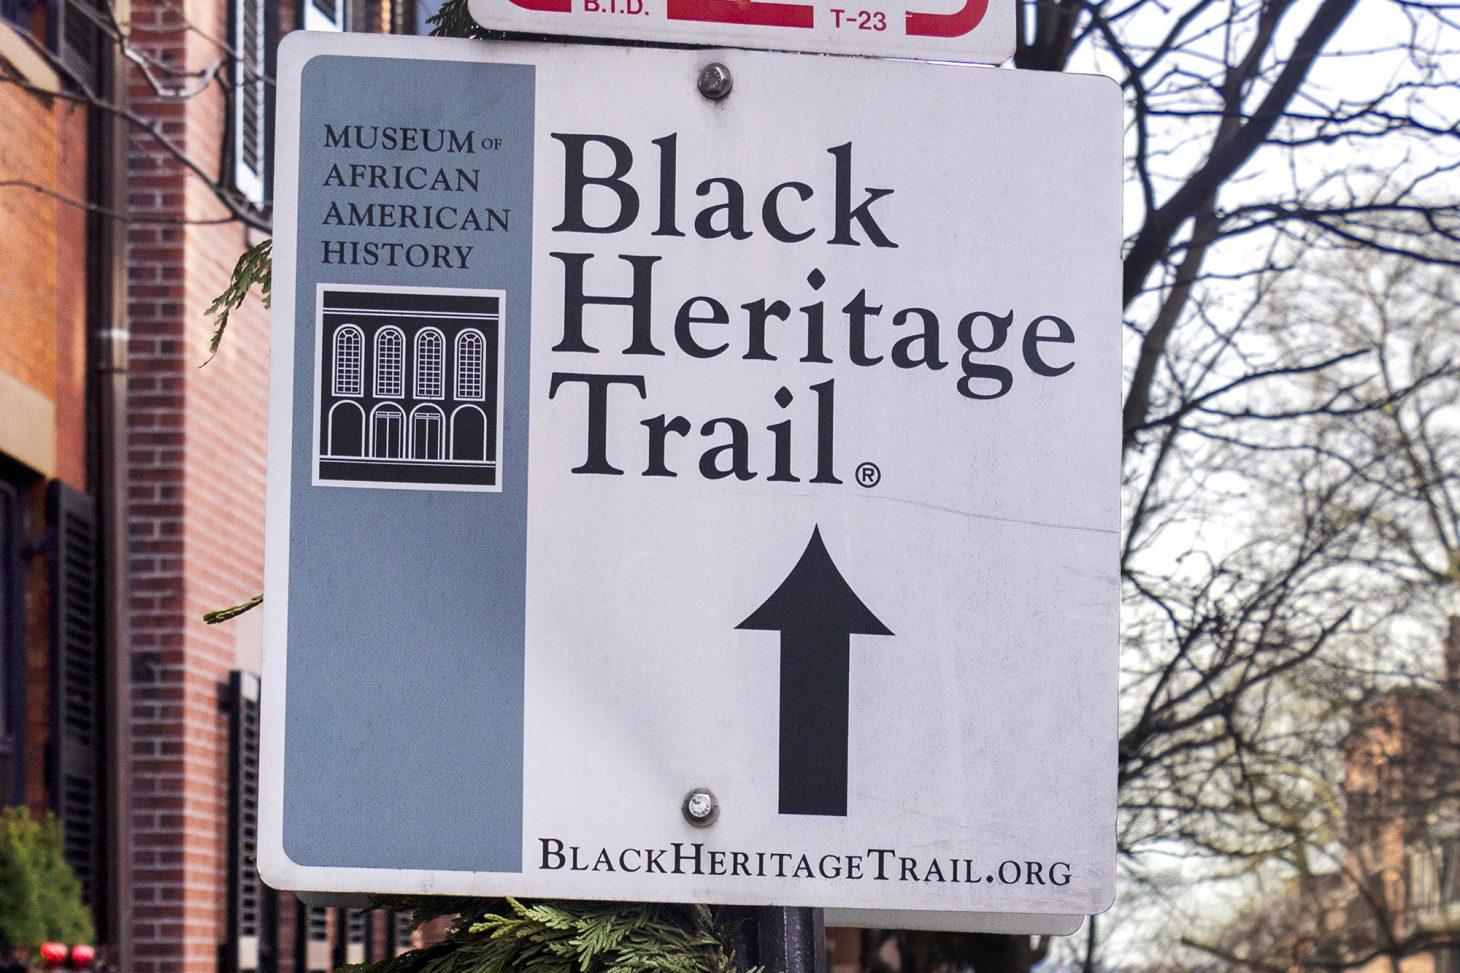 Black Heritage Trail, Boston